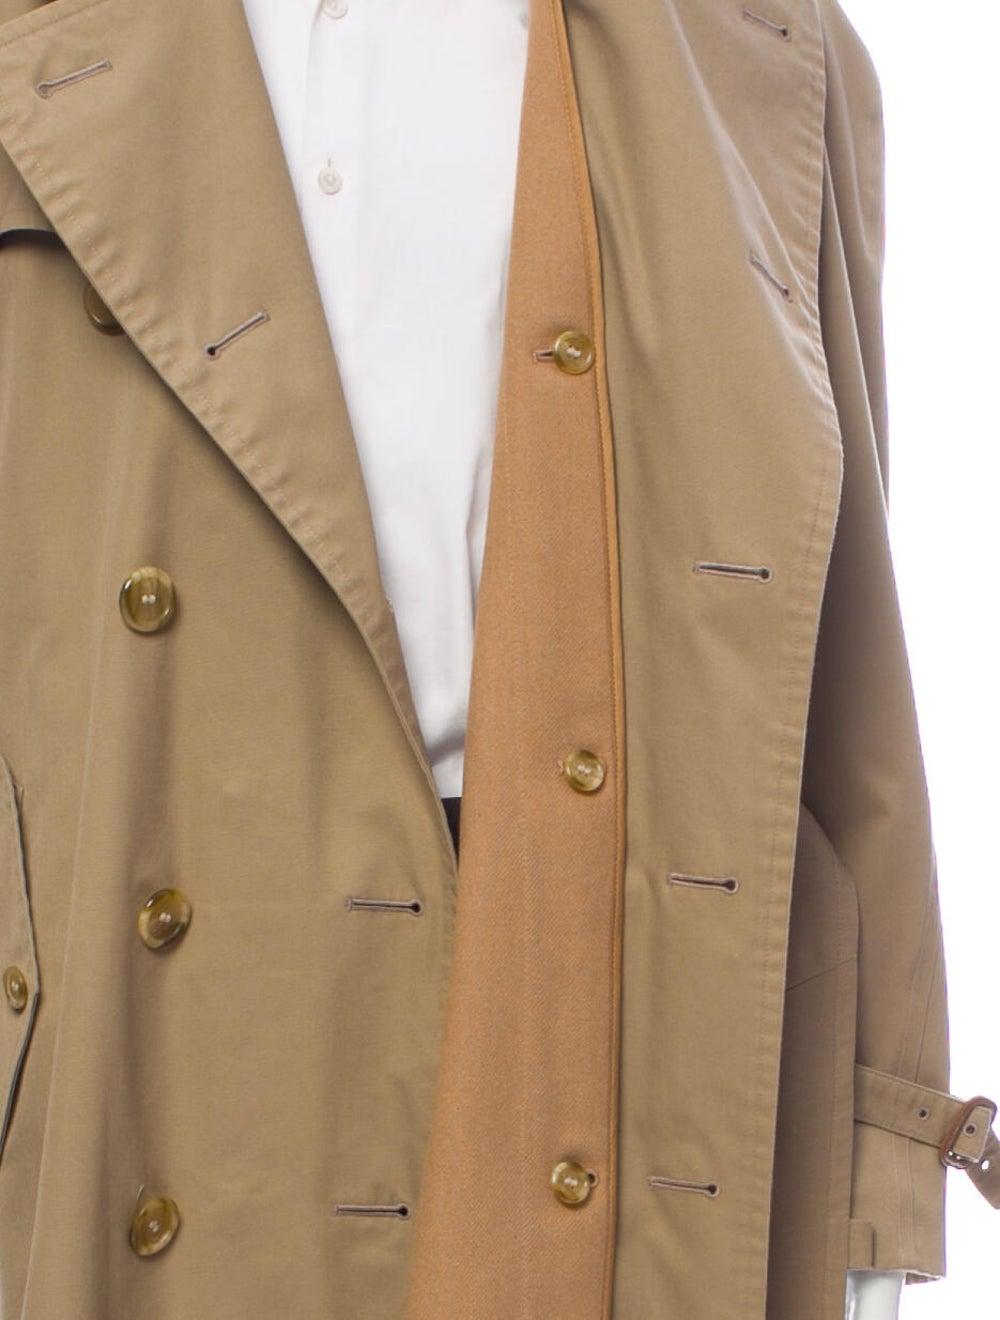 Burberry Trench Coat - image 4